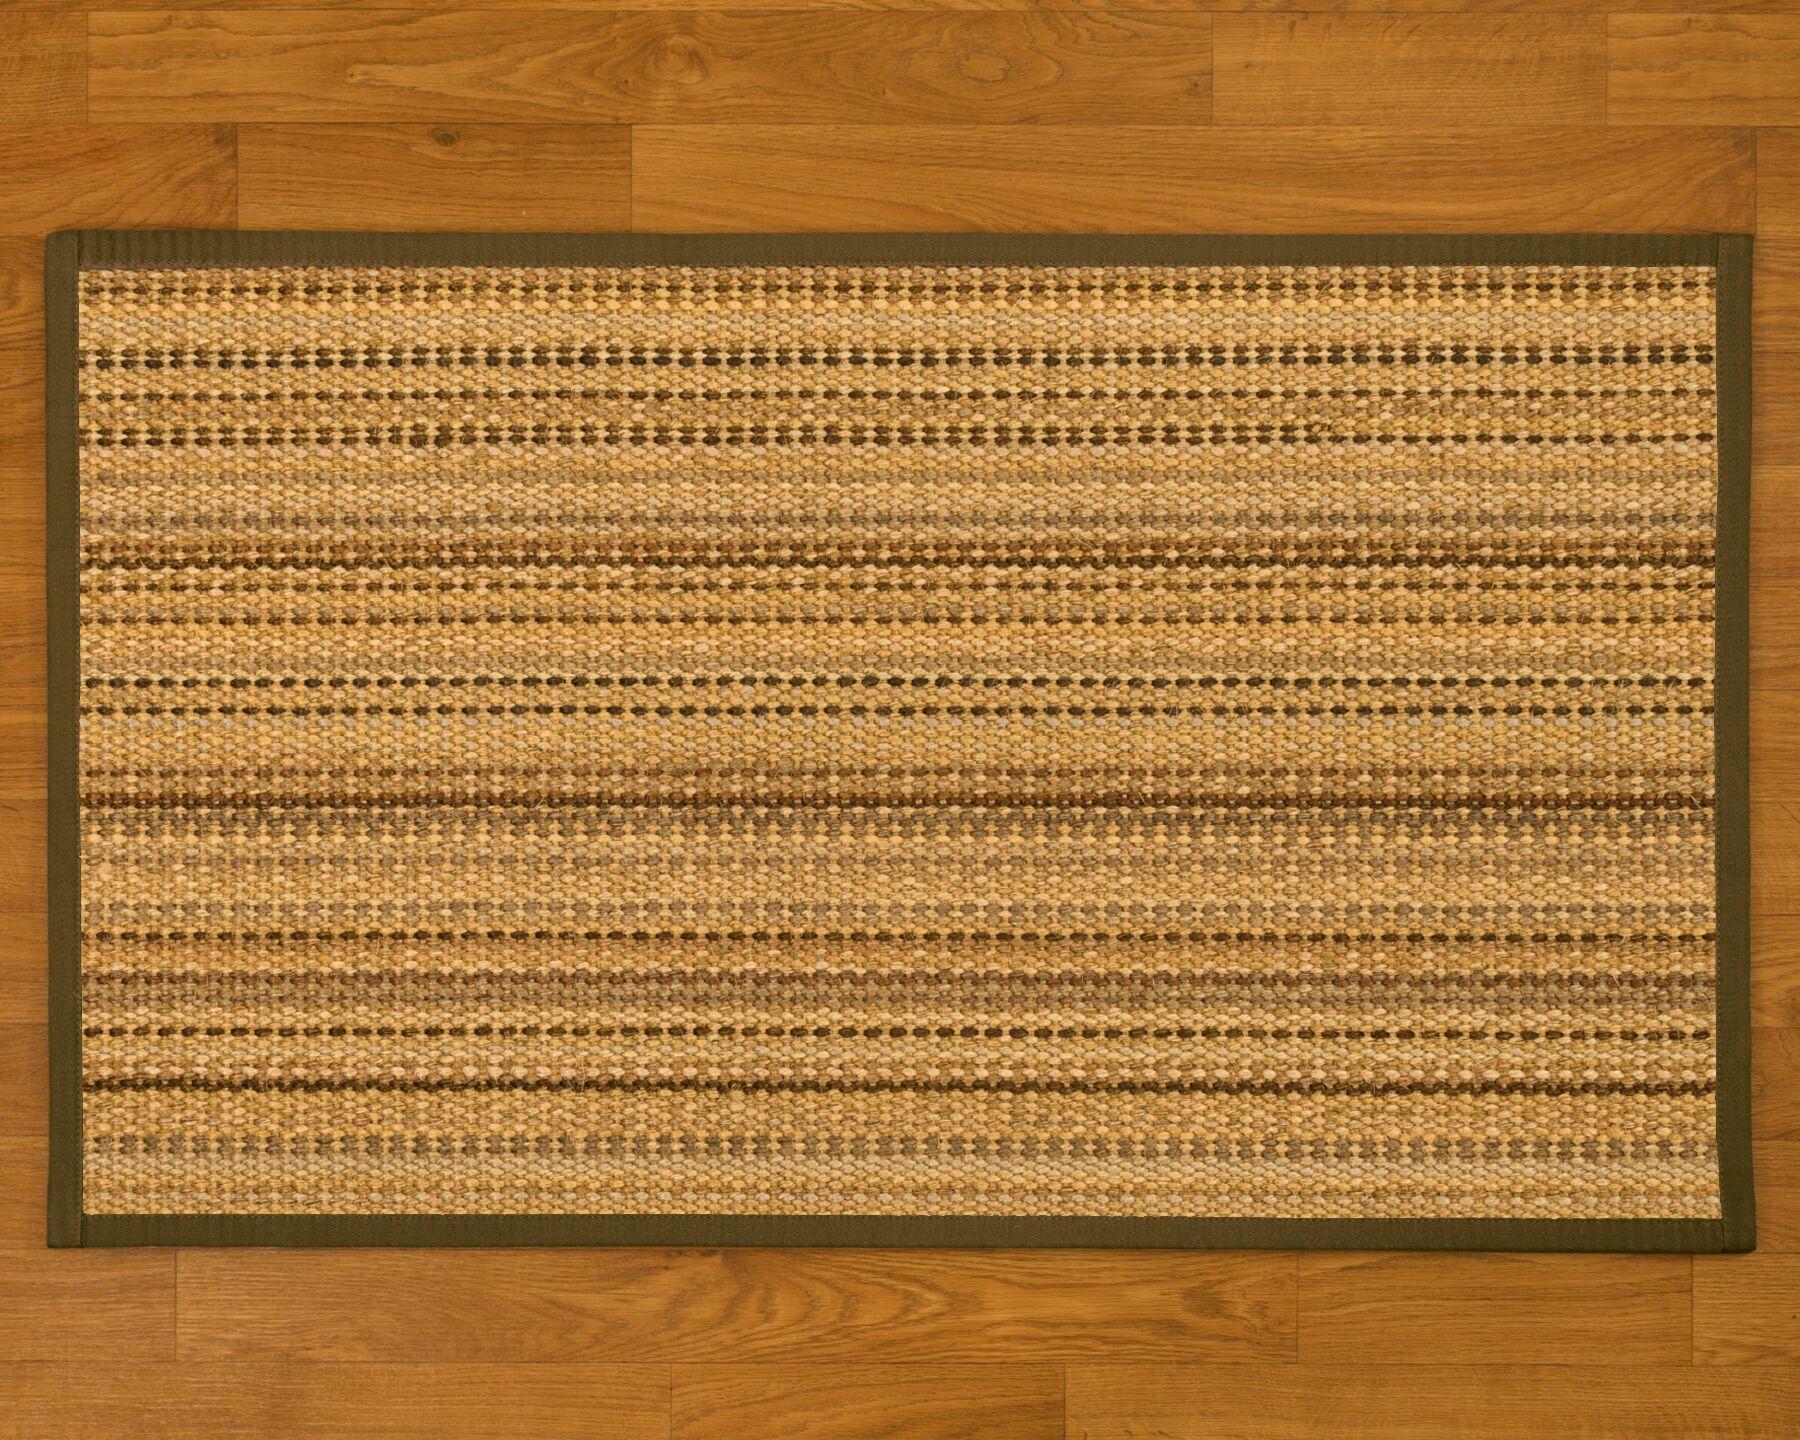 Buschwick Handmade Beige Area Rug Rug Size: Rectangle 6' x 9'